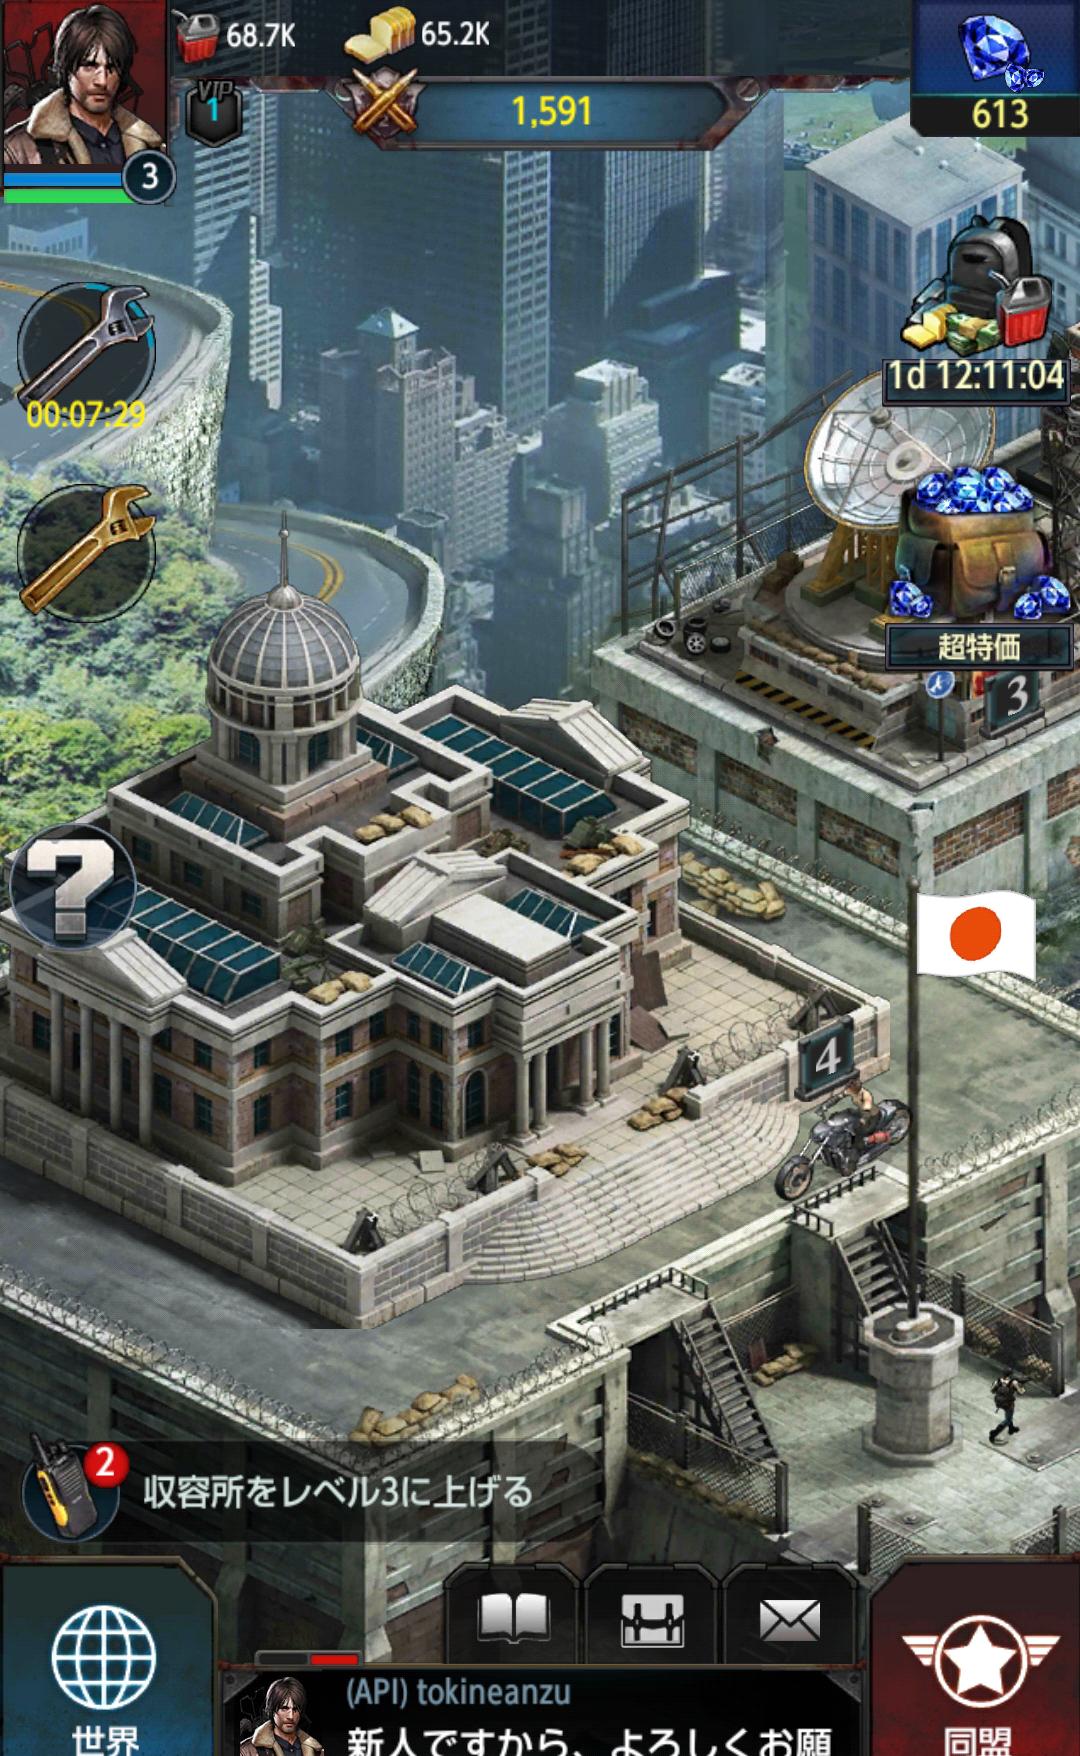 androidアプリ Last Empire-War Z攻略スクリーンショット2